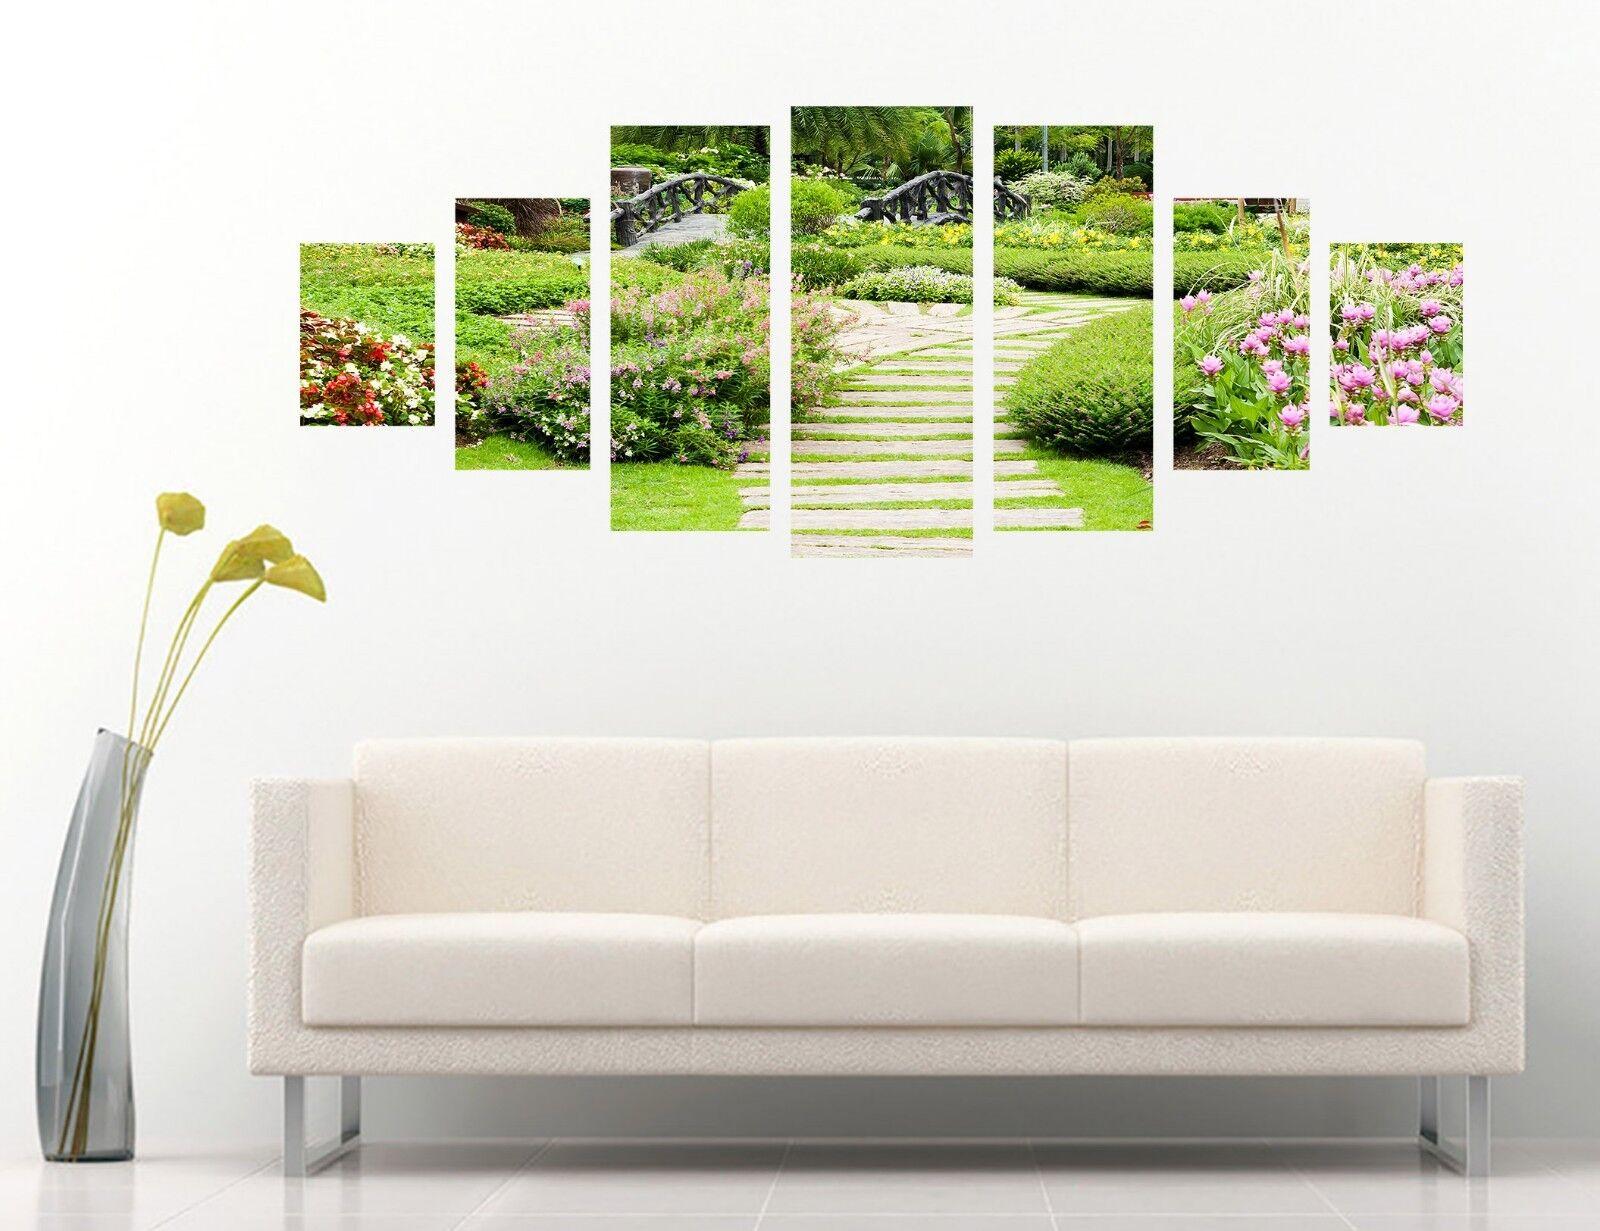 3D Garden Trail 68 Unframed Print Wall Paper Decal Wall Deco Indoor AJ Wall